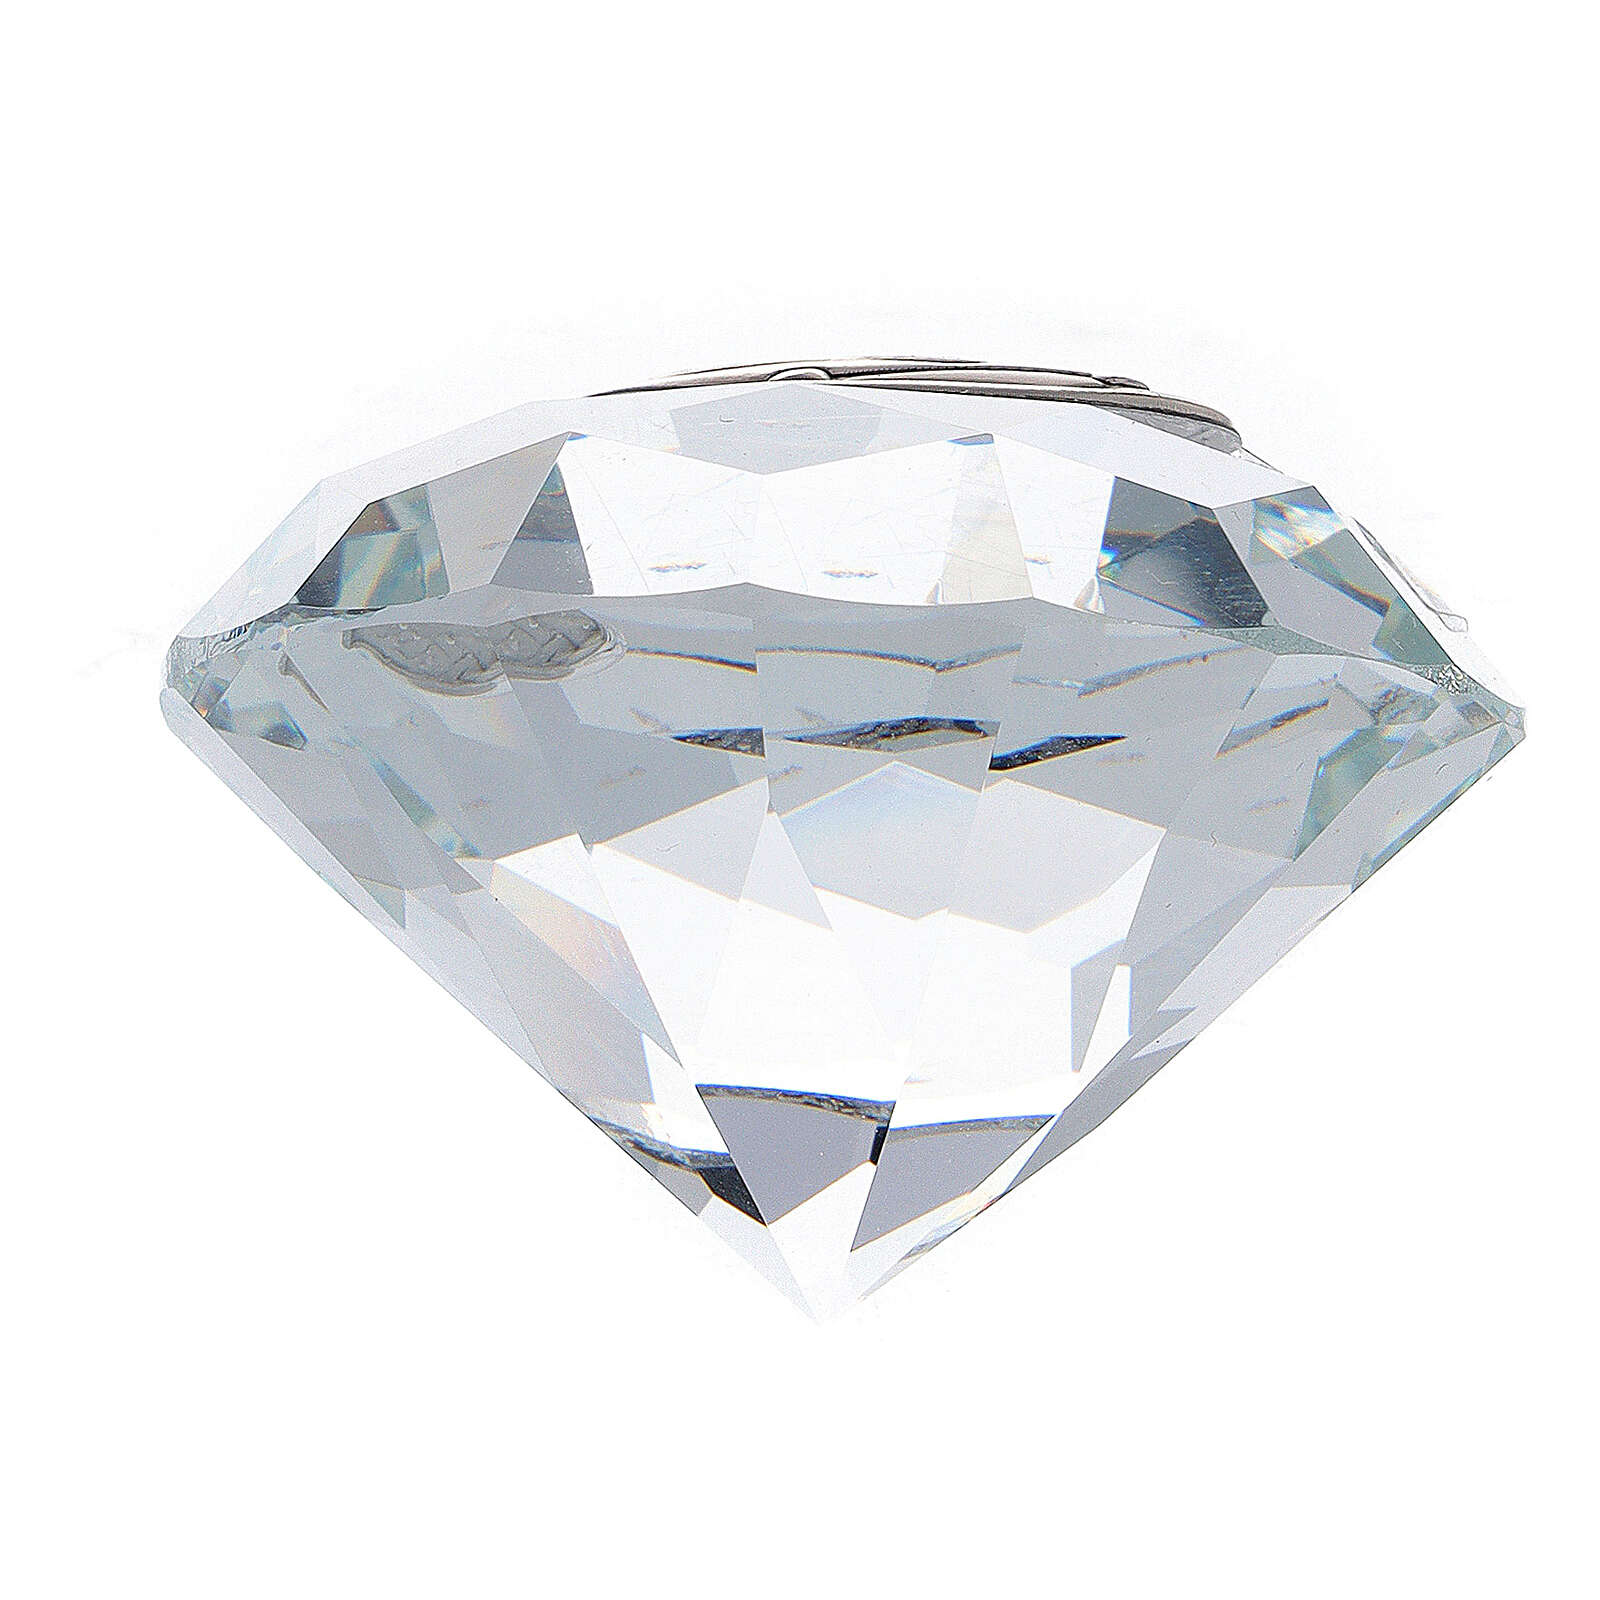 Souvenir mariage verre forme diamant 3